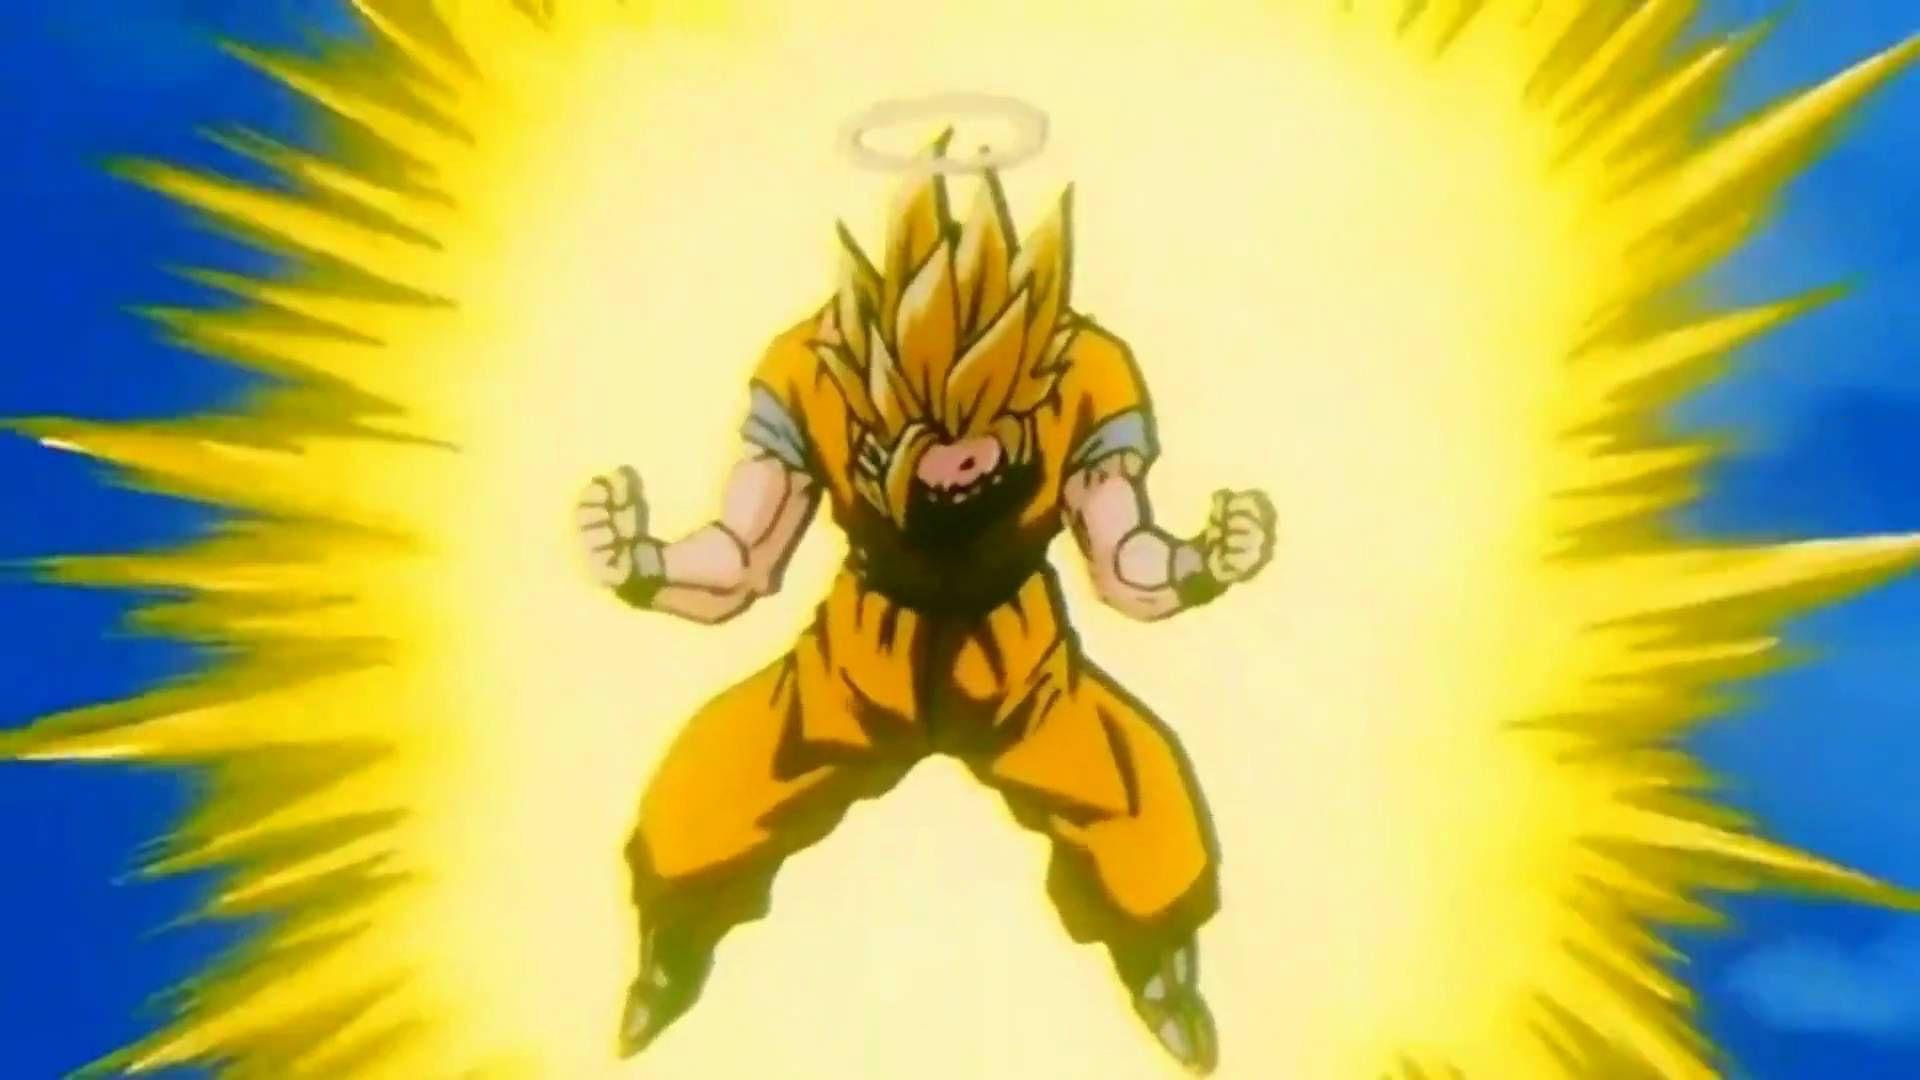 Goku Goes Super Saiyan 3 Remastered Hd 1080p Goku Goes Super Saiyan Goku Super Saiyan